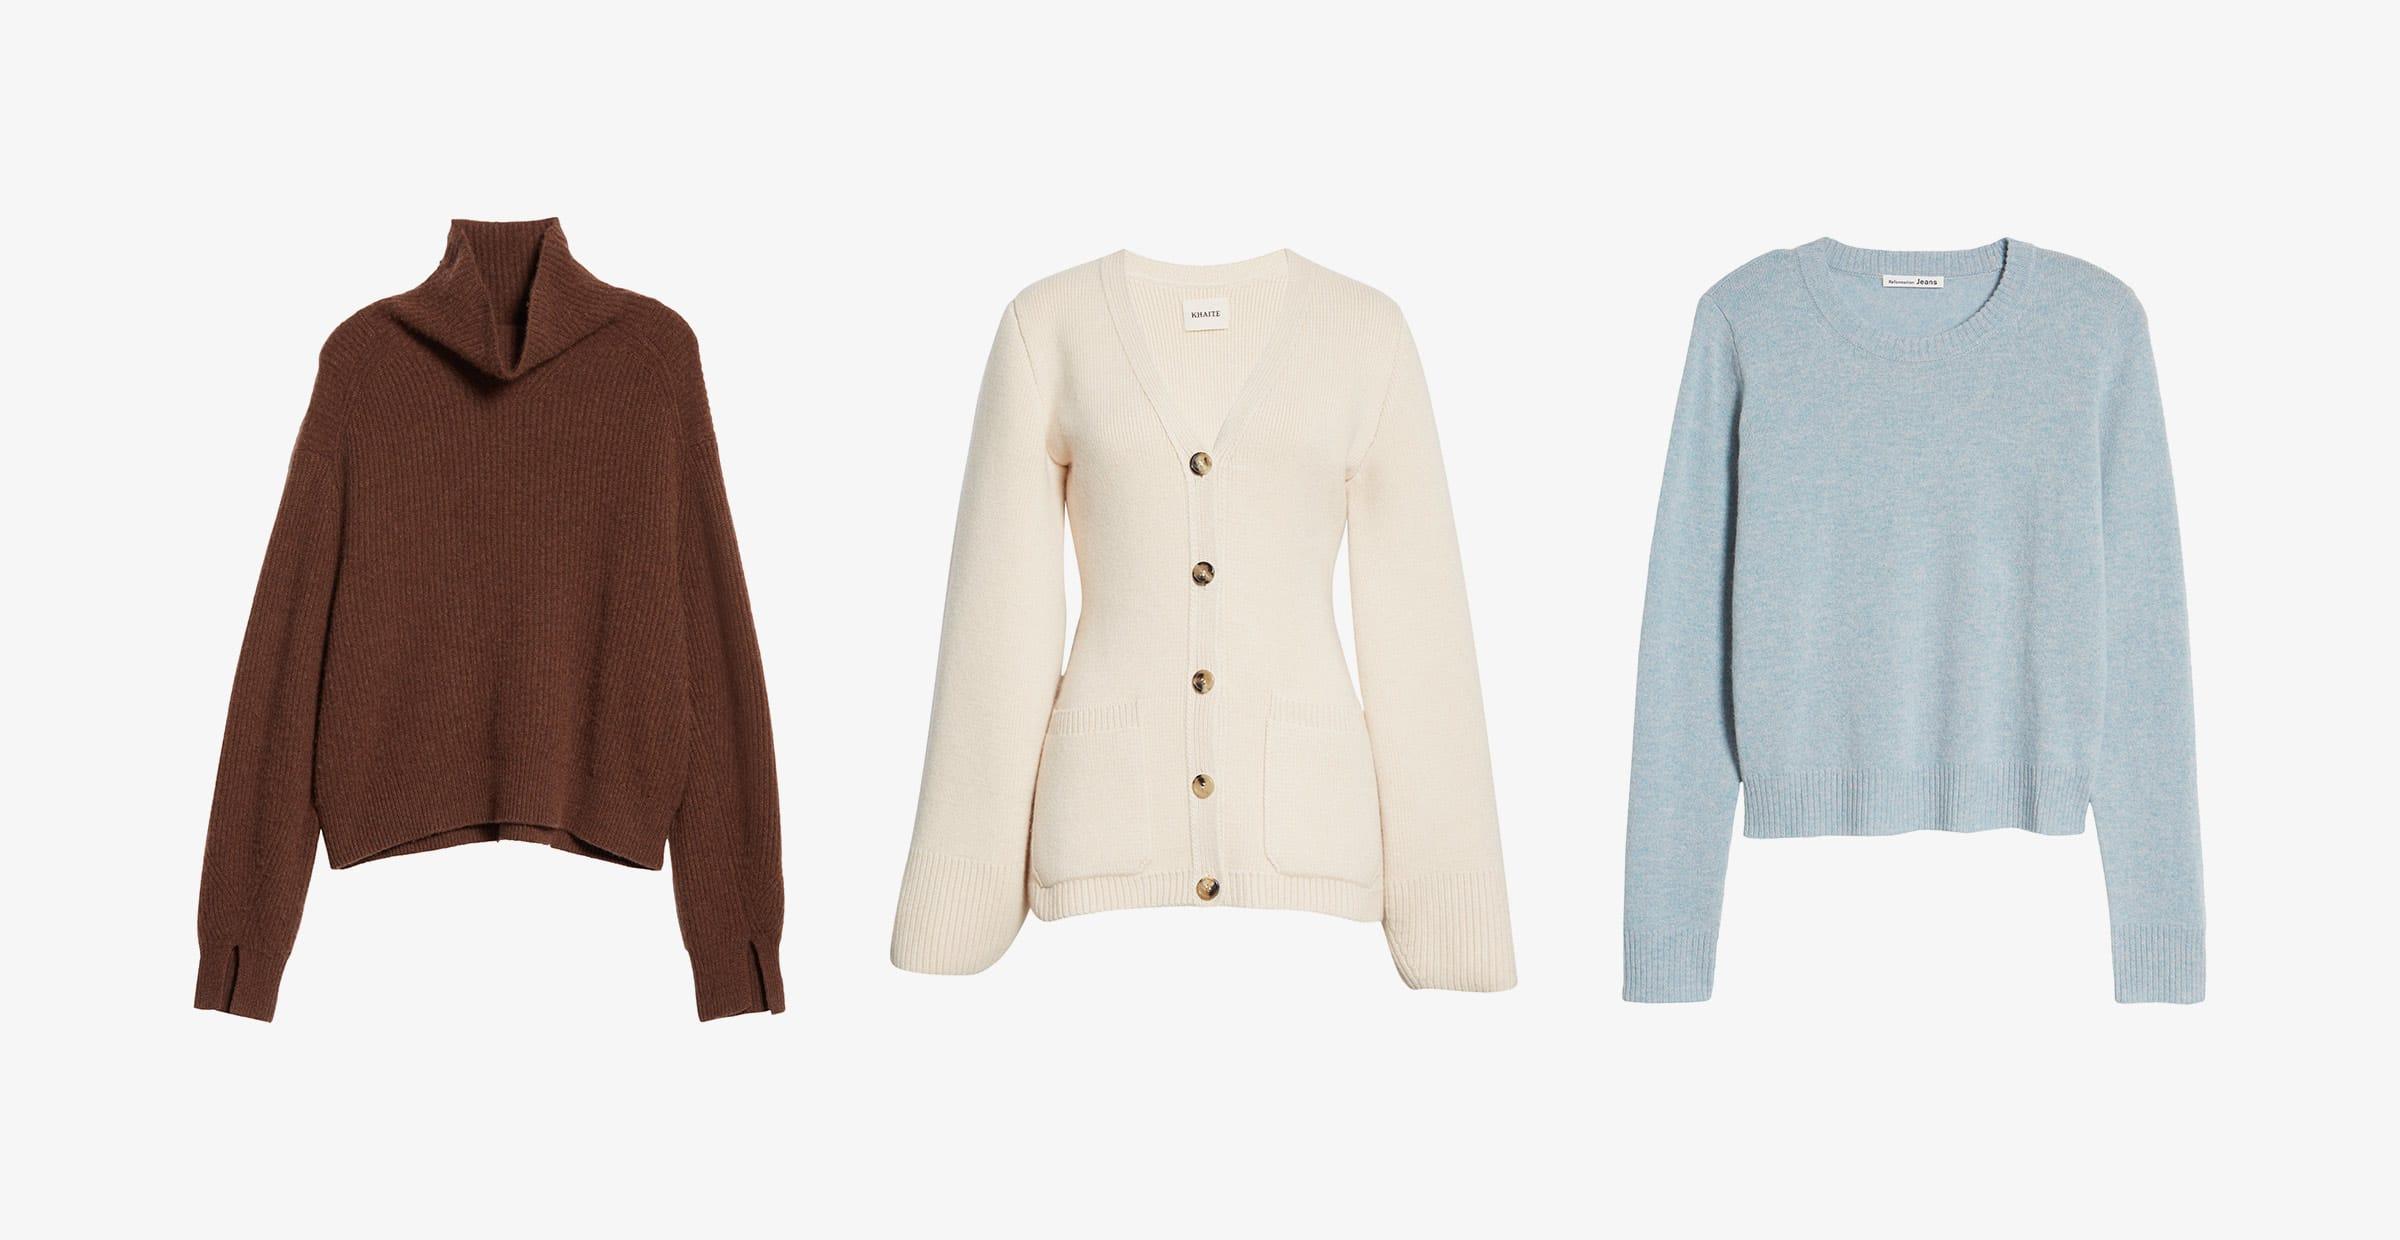 brown womens turtleneck, cream womens cardigan, blue crewneck womens sweater